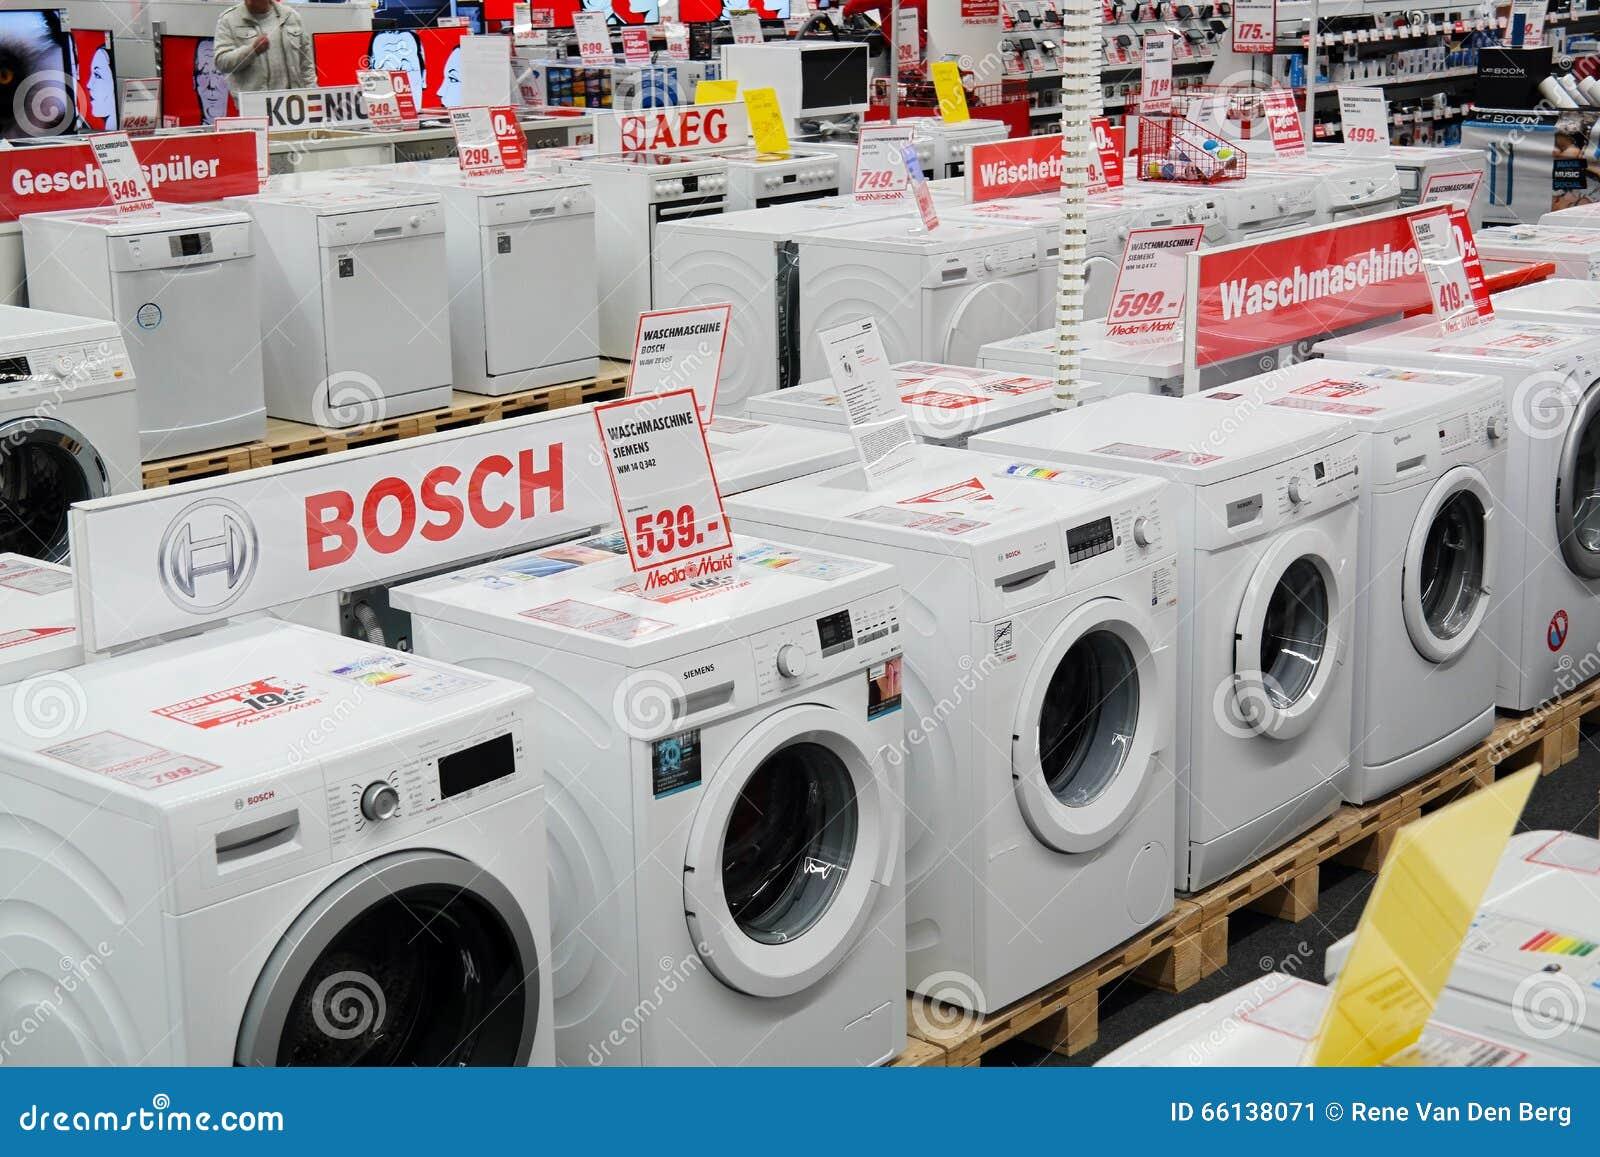 Miele Washing Machine >> Washing Machines store editorial photo. Image of household - 66138071